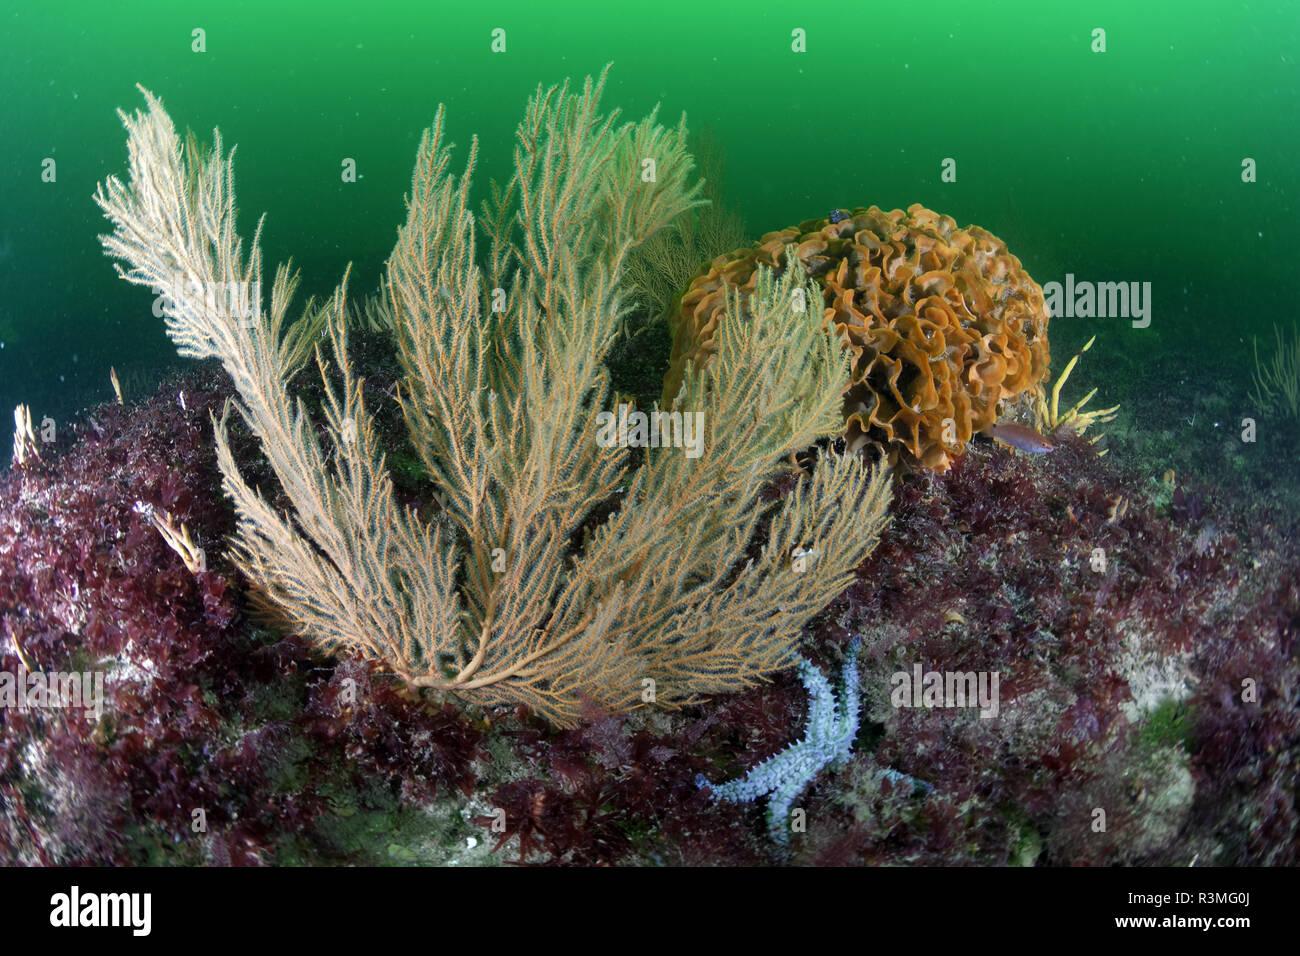 Rose coral (Pentapora fascialis) and Orange Gorgonian (Leptogorgia sarmentosa) - 20 meters deep, off the island of Oleron, Atlantic Ocean, France Stock Photo